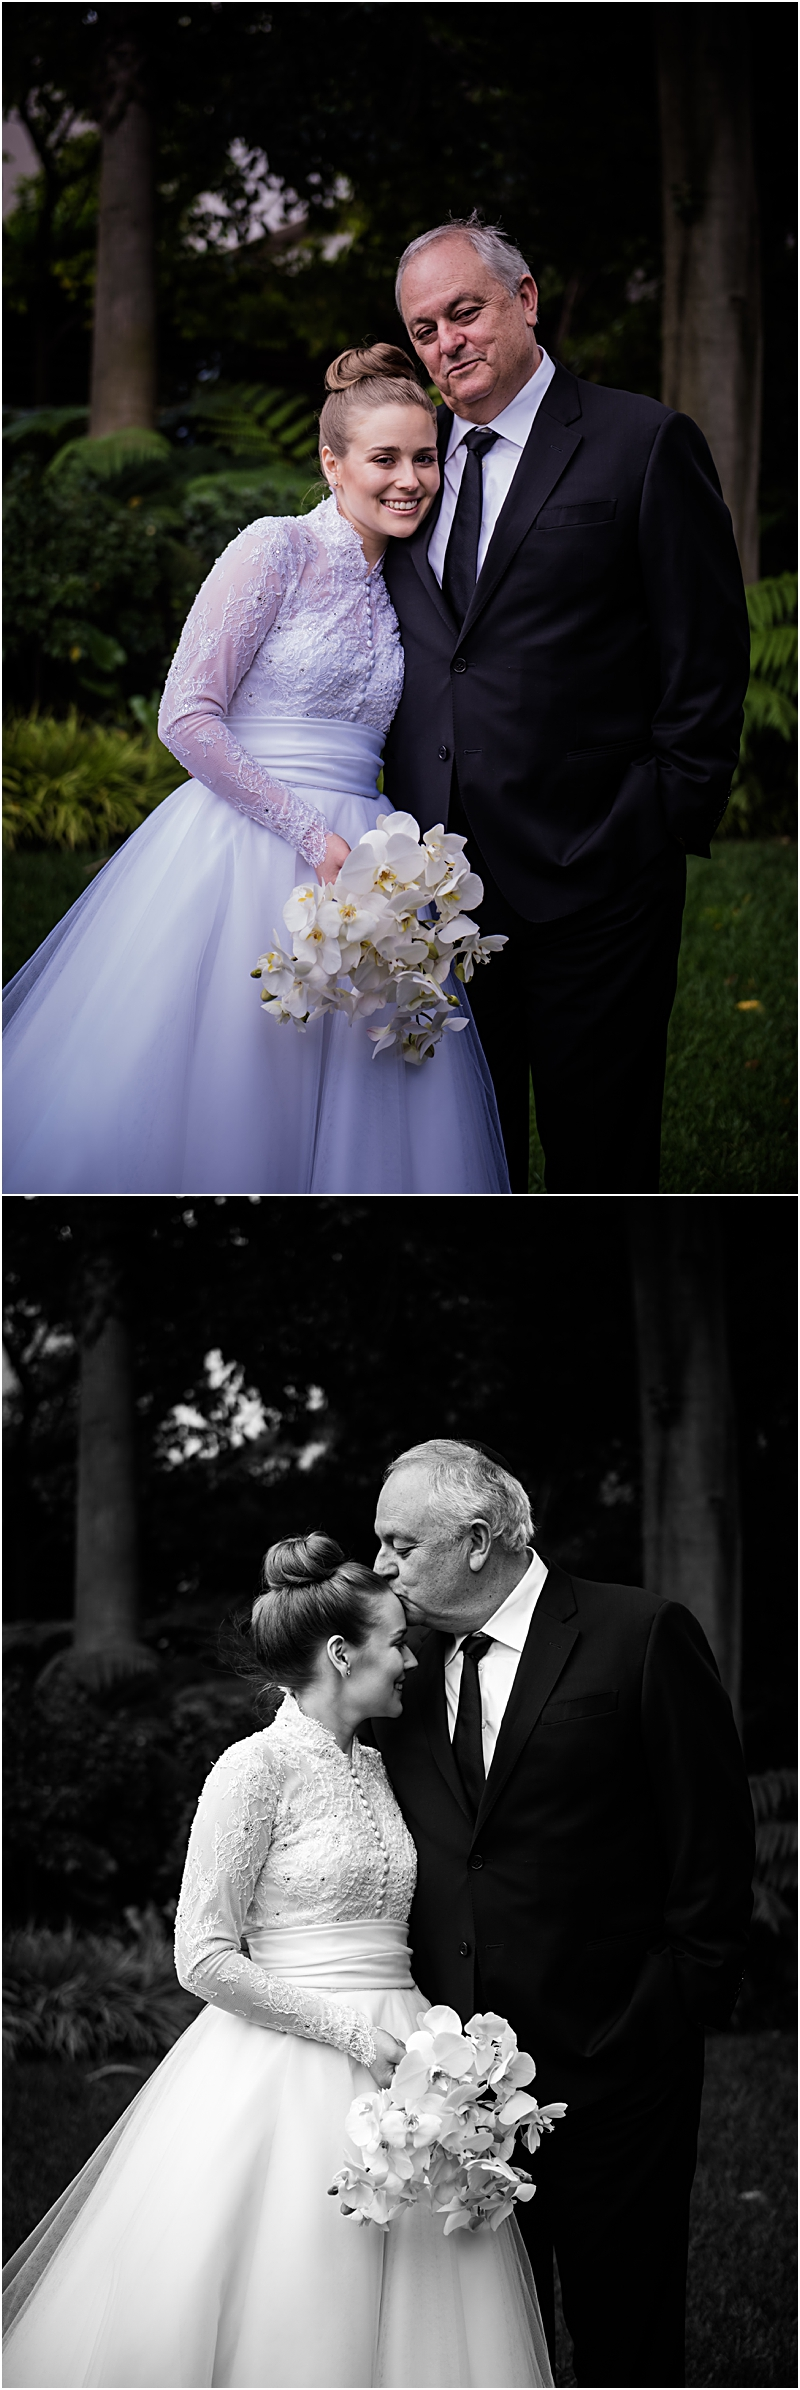 Best wedding photographer - AlexanderSmith_0917.jpg